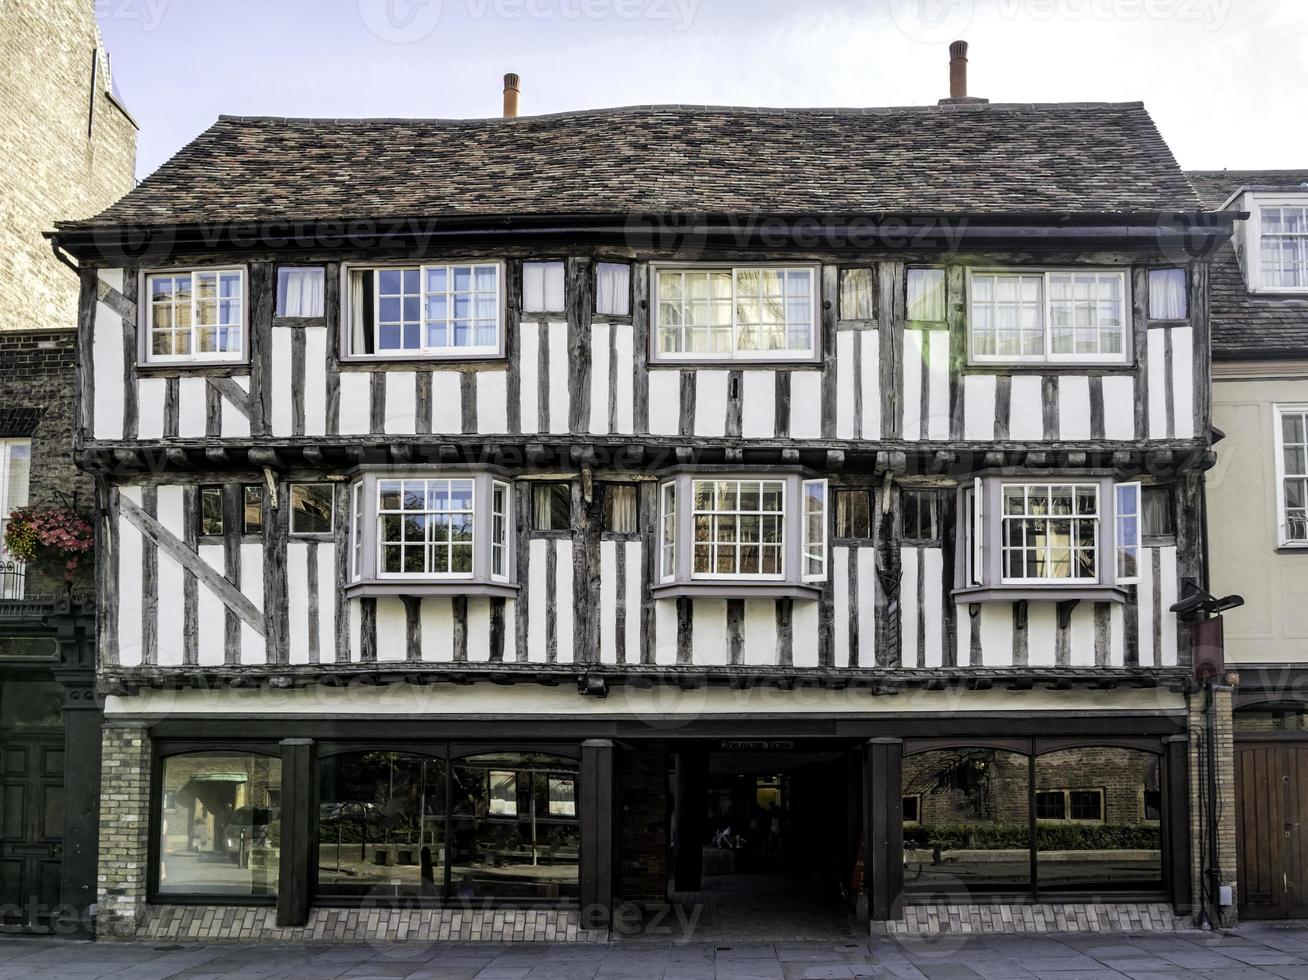 casa a graticcio a Cambridge, Inghilterra foto